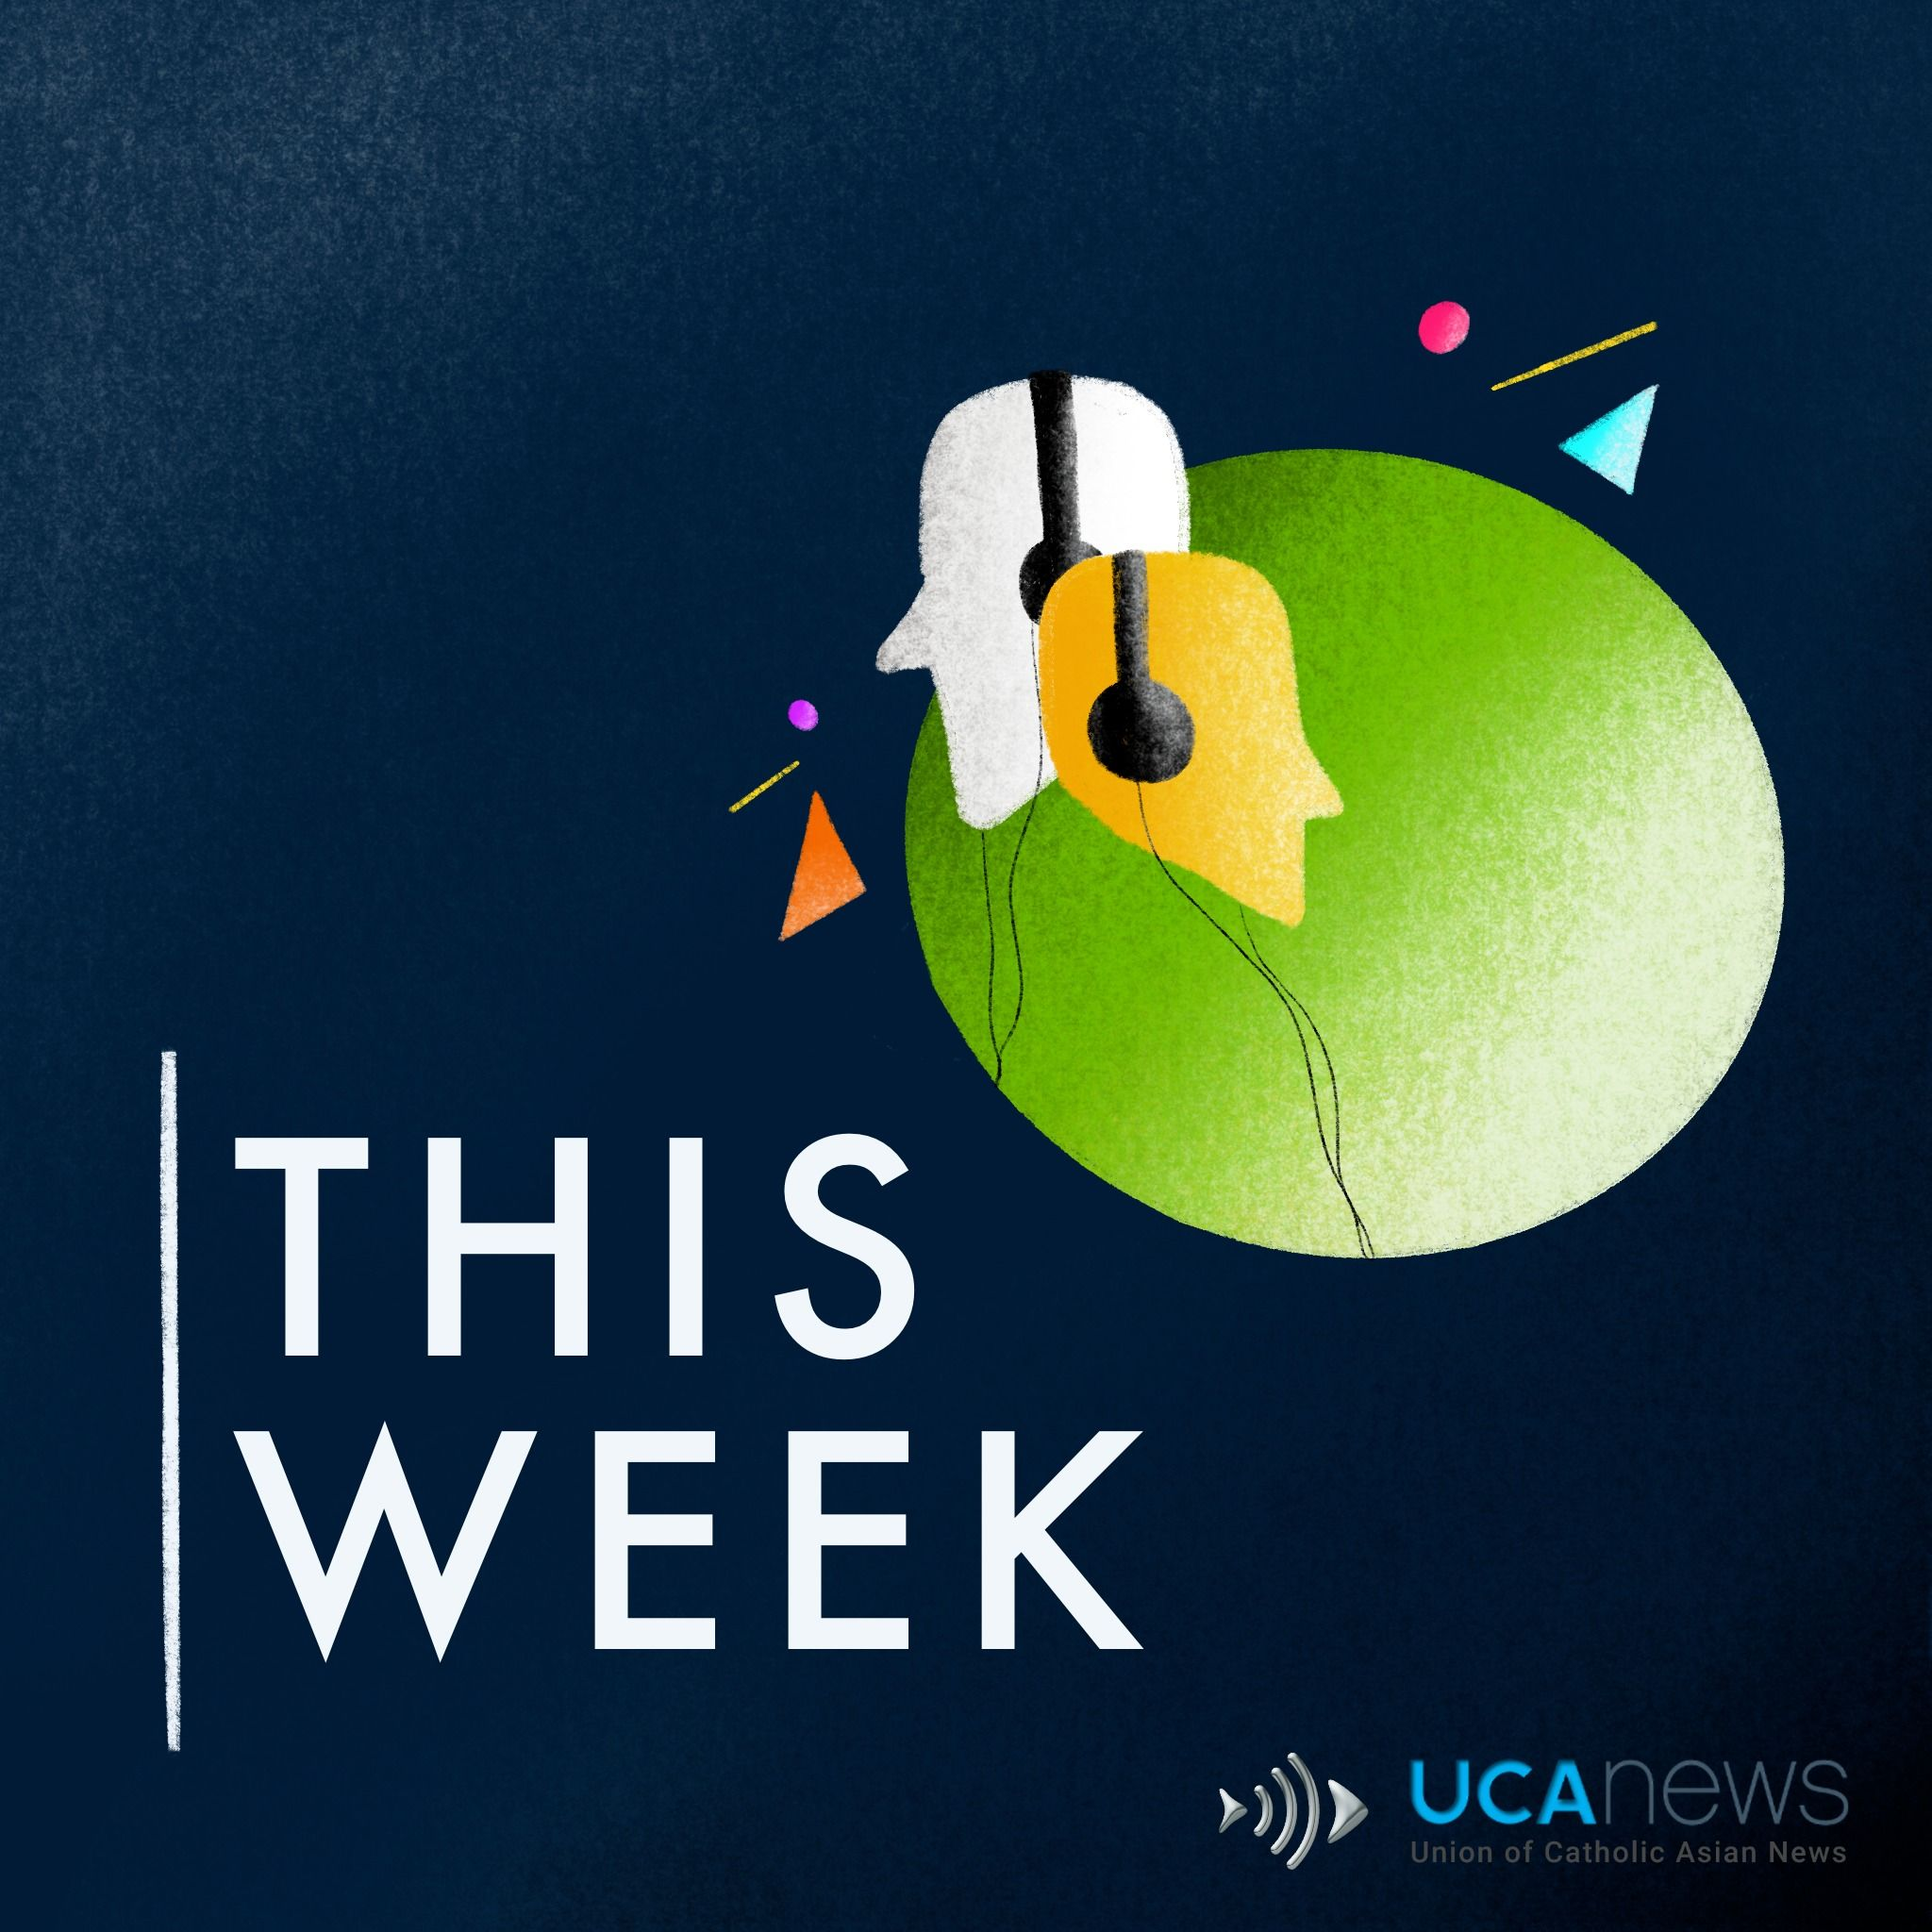 UCA News Weekly Summary, June 25, 2021